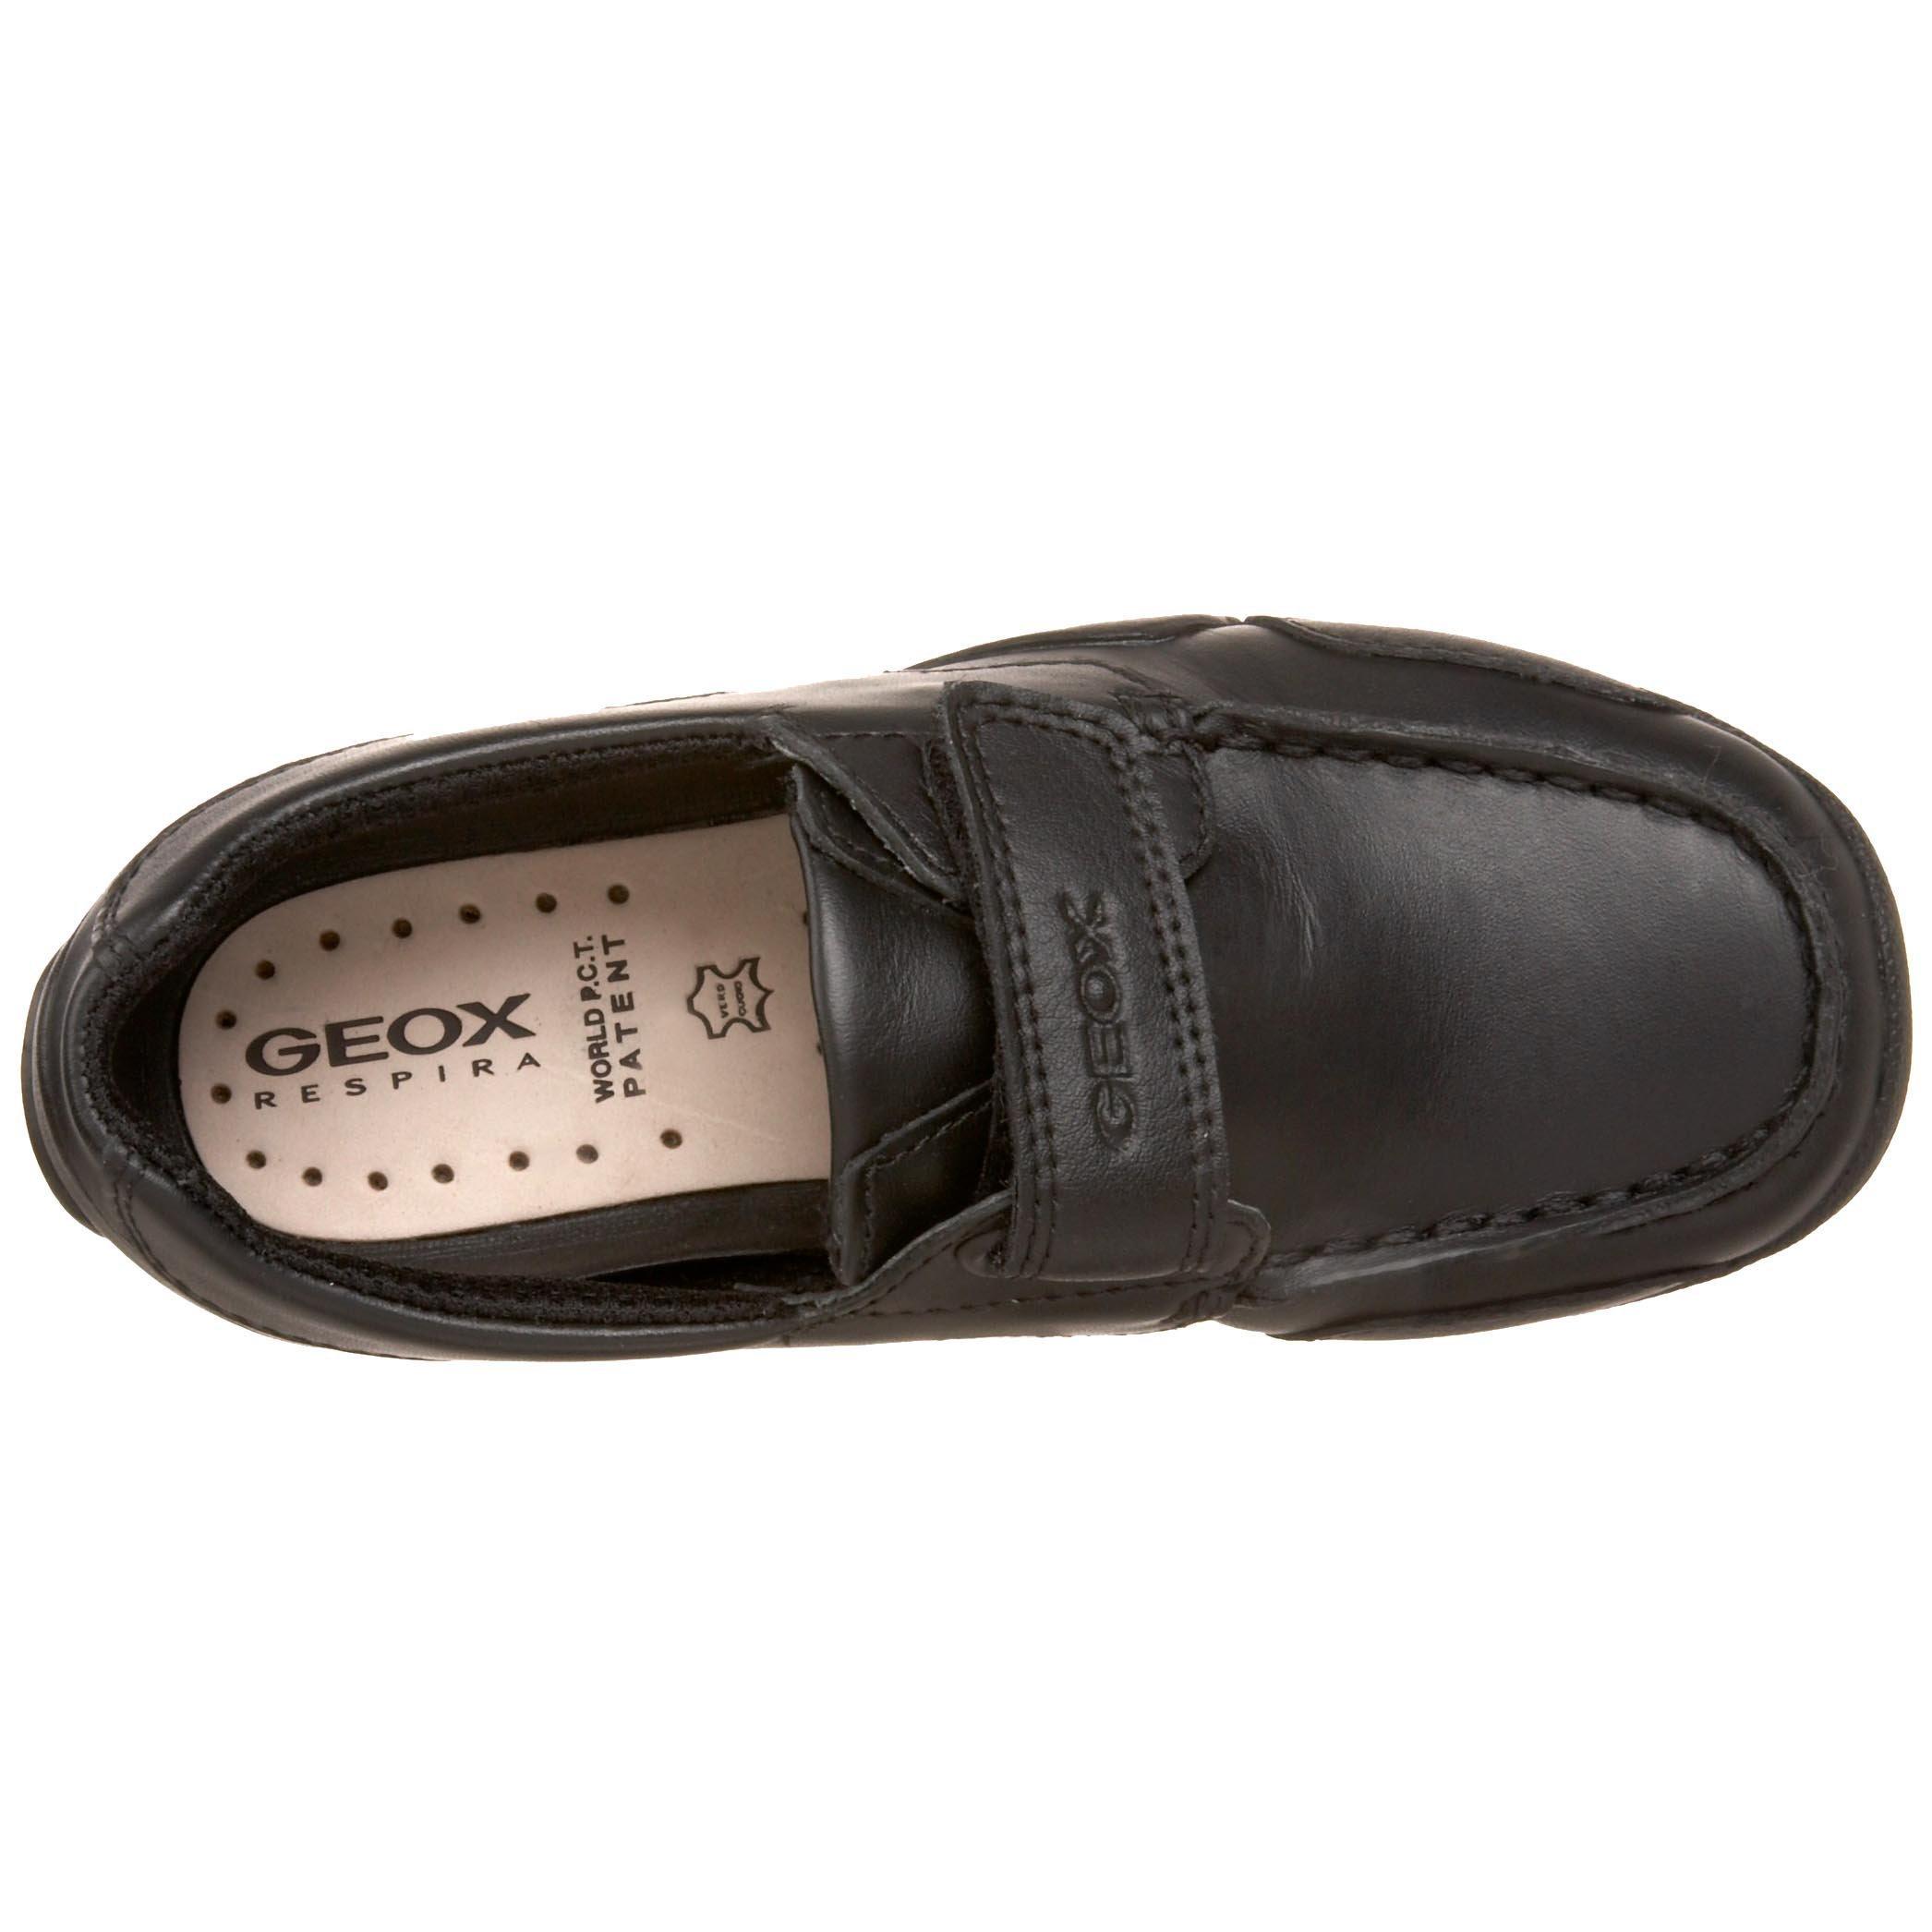 Geox Boy's JR W.SNAKE MOCASSINO Shoe,black,37 M EU Big Kid (5 US) by Geox (Image #7)